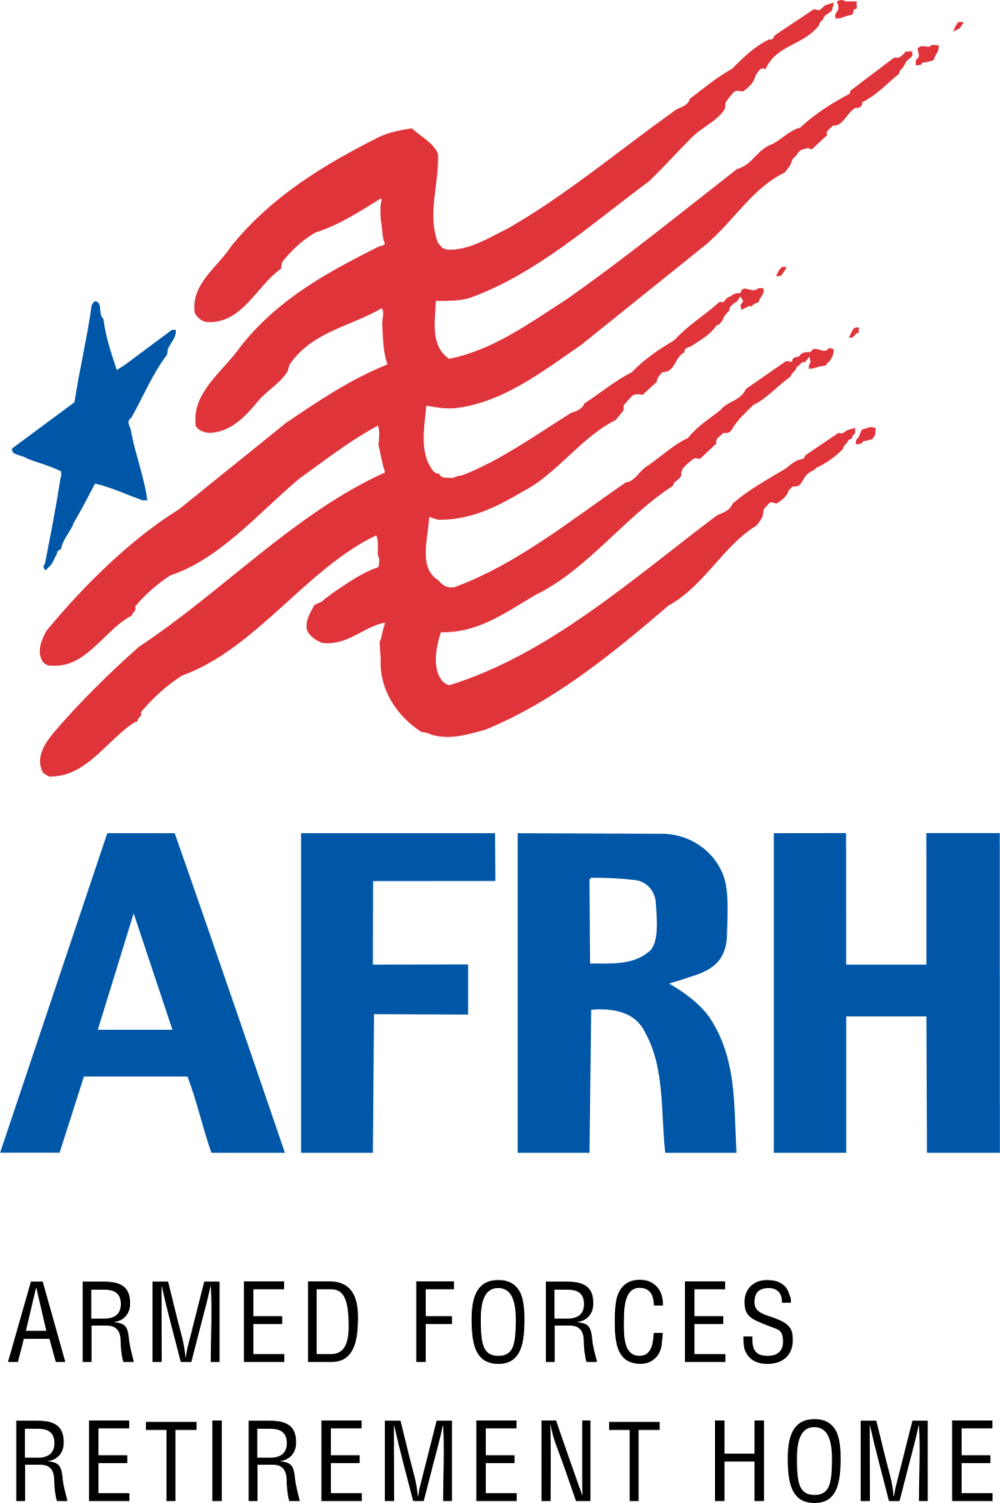 afrh-logo-tr.png